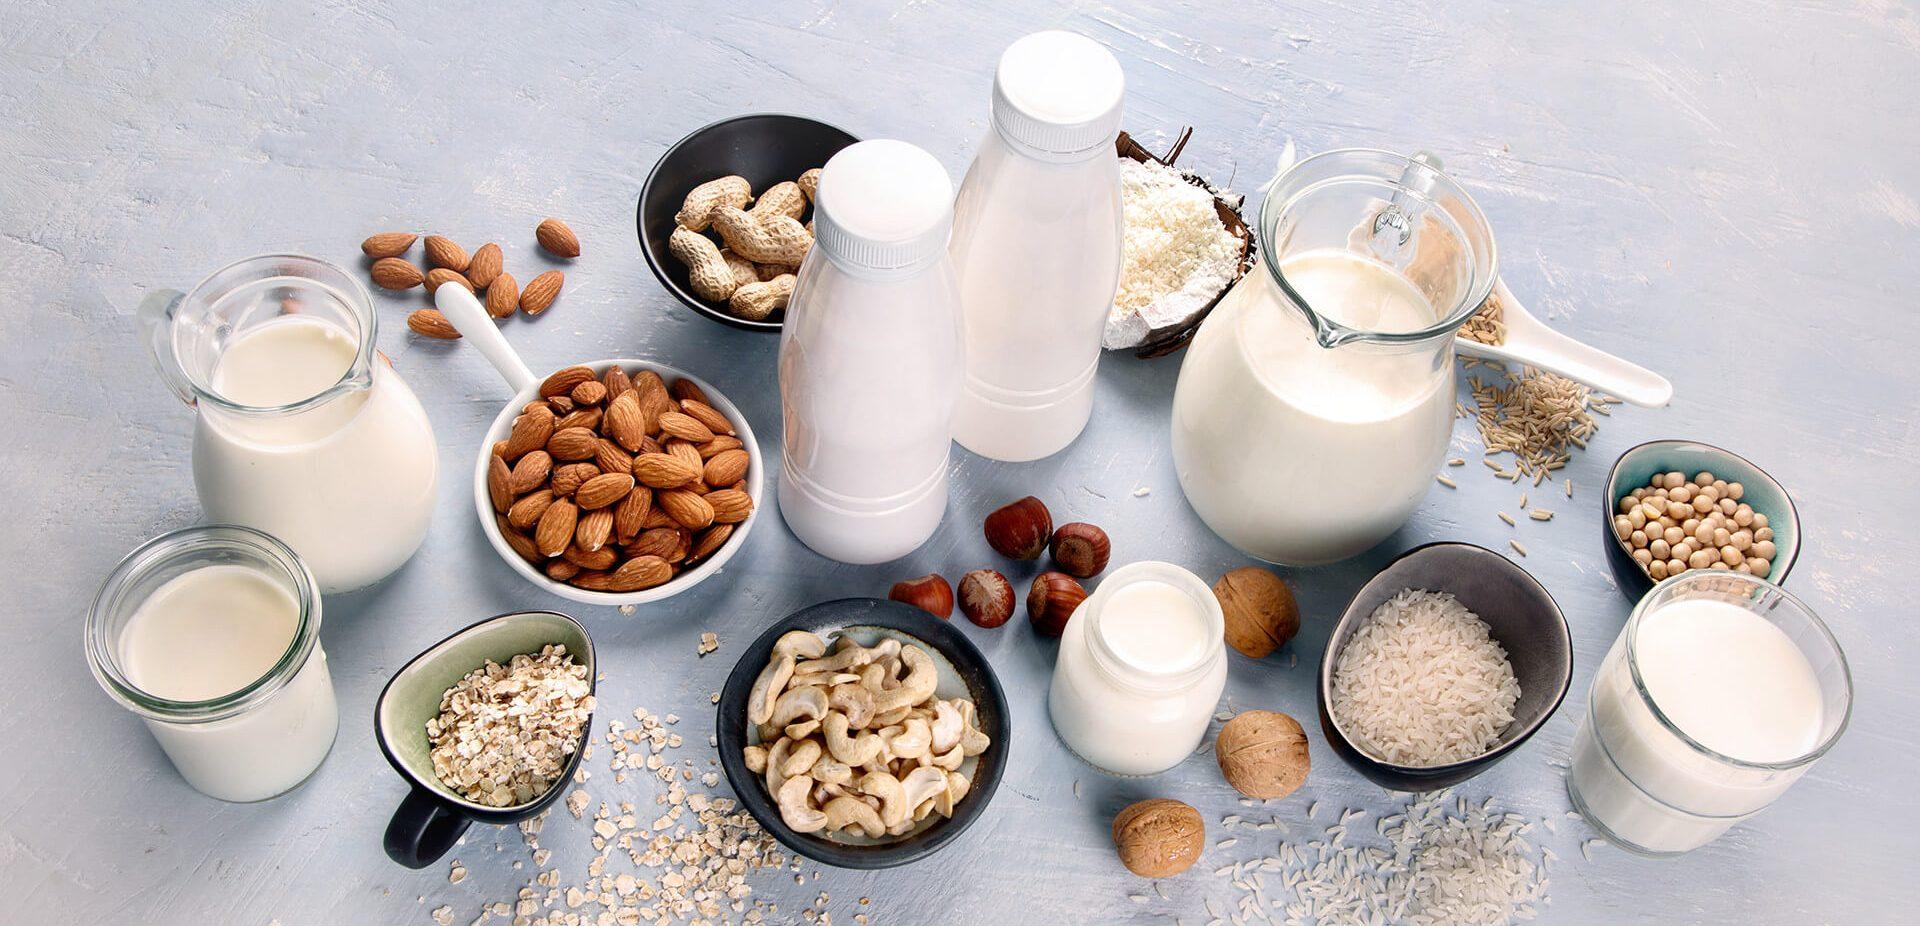 Offering various plant-based milk alternatives such as Almond Milk, Oat Milk, Soy Milk, Coconut Milk and Hazelnut Milk